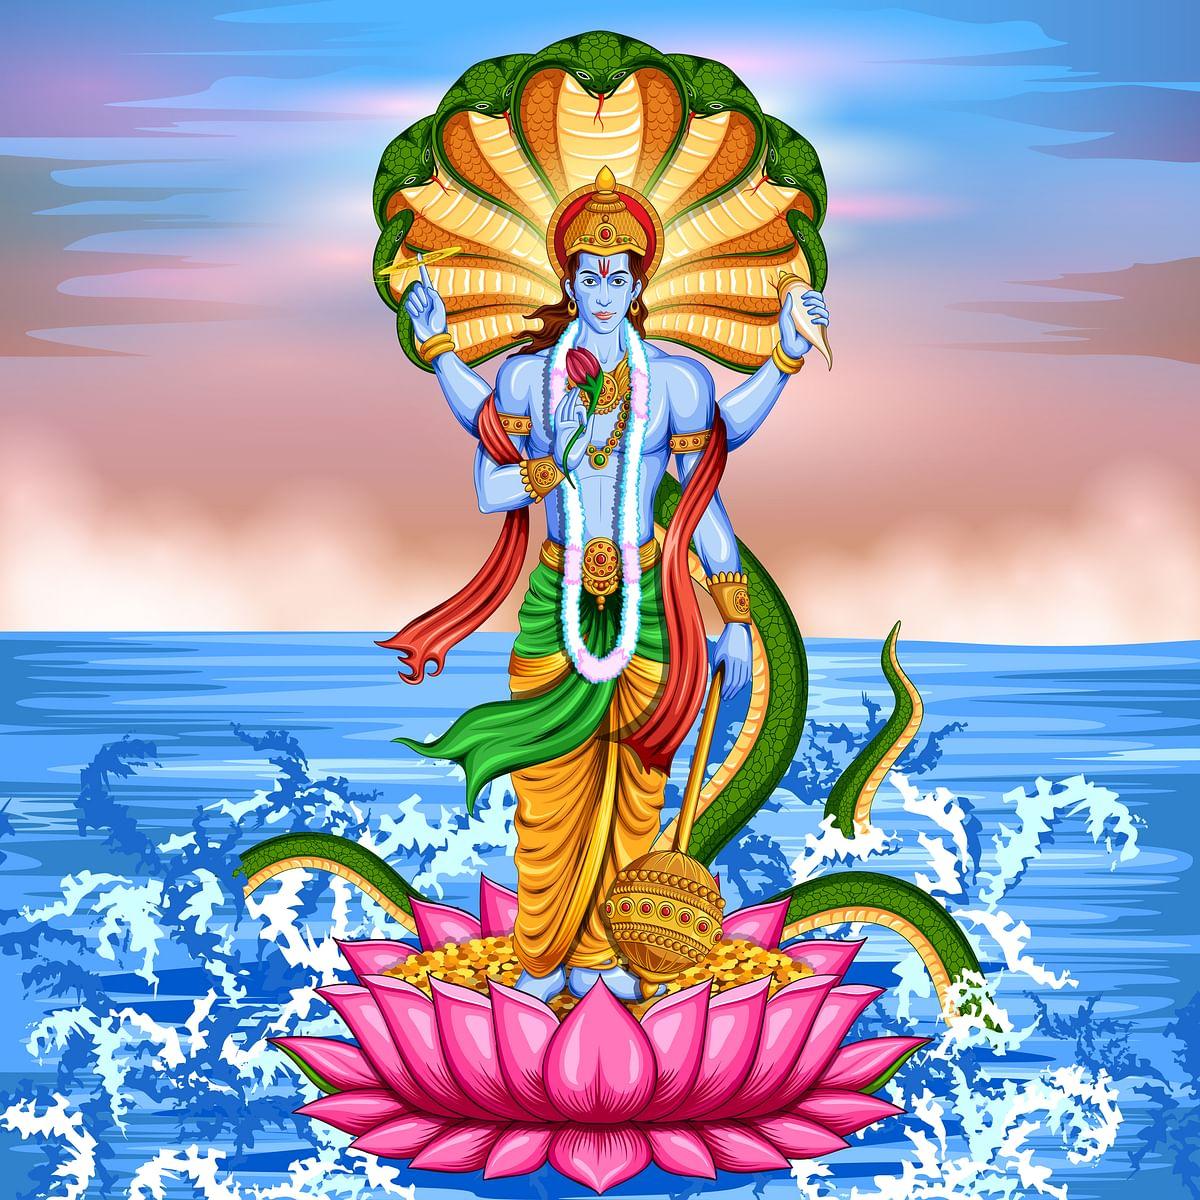 इन्दिरा एकादशी व्रत विधि - Kalash Sthapana Vidhi